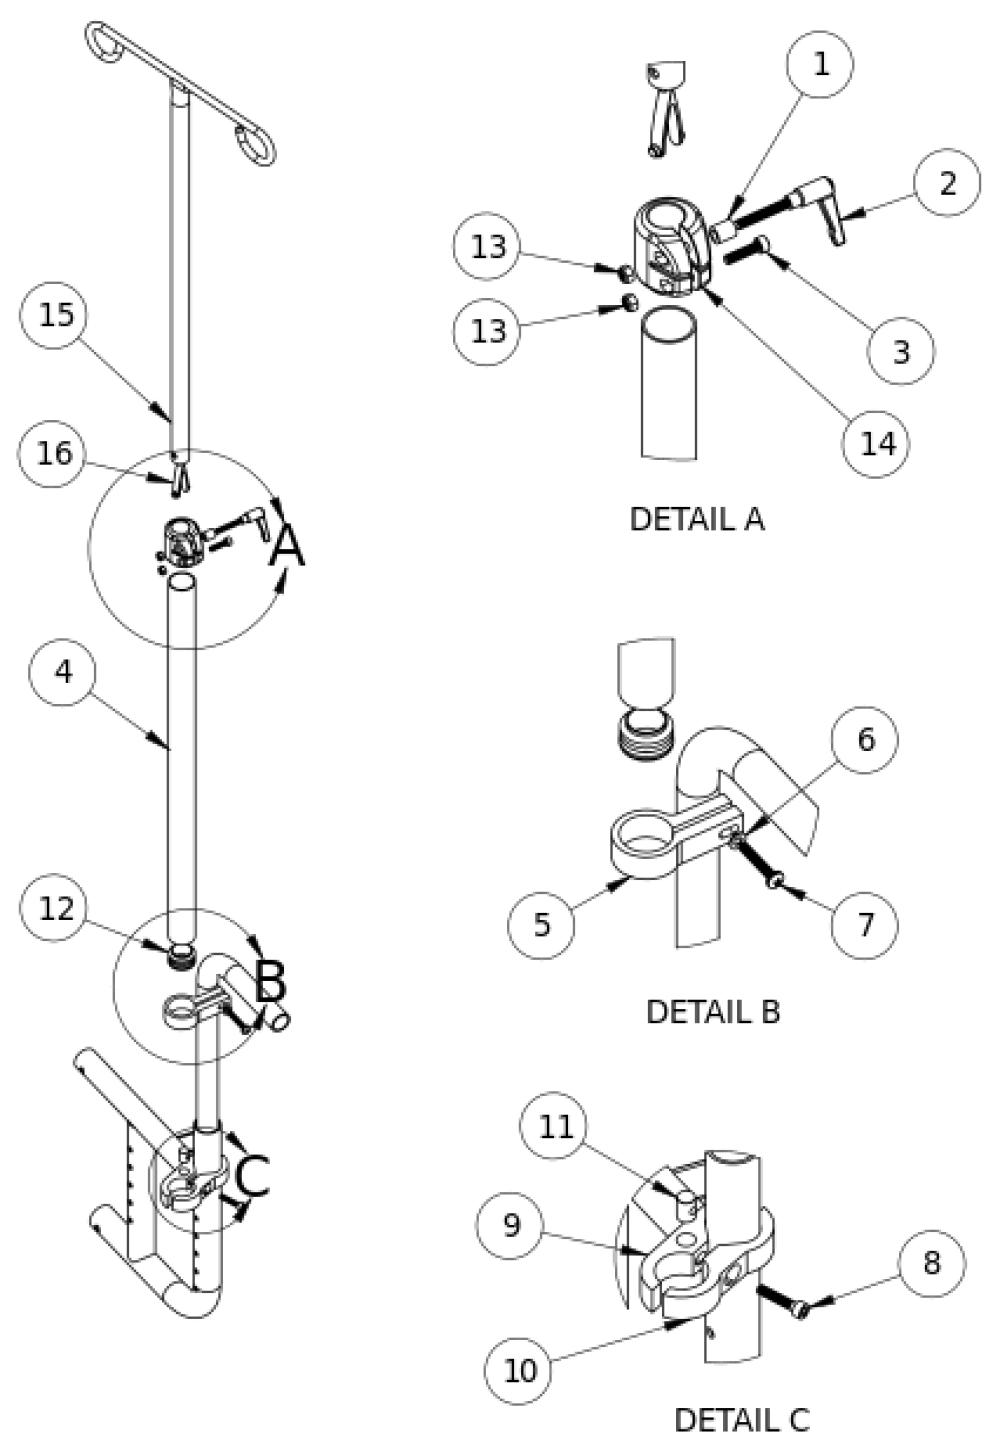 Catalyst Iv Pole parts diagram